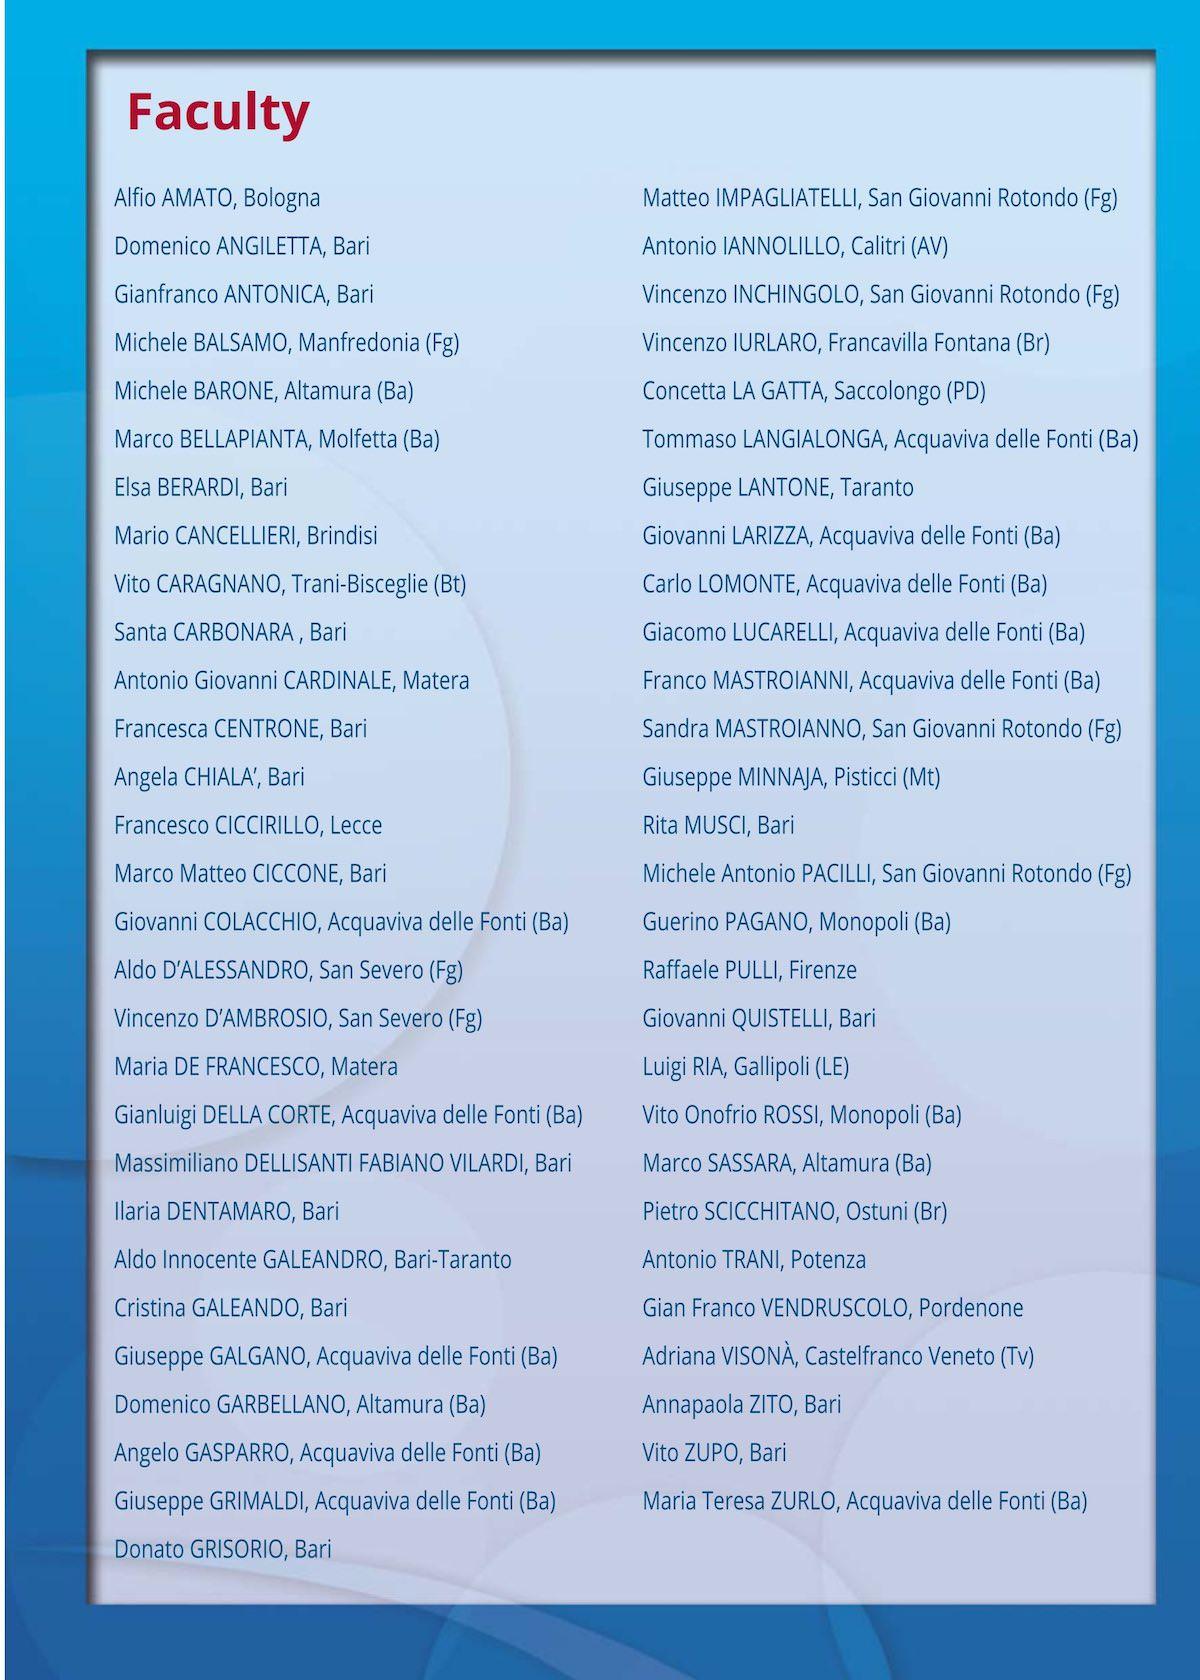 medical-tools-al-convegno-regionale-siapav-diagnosis-management-and-rehabilitation-of-vascular-disease-valenzano-2016-2